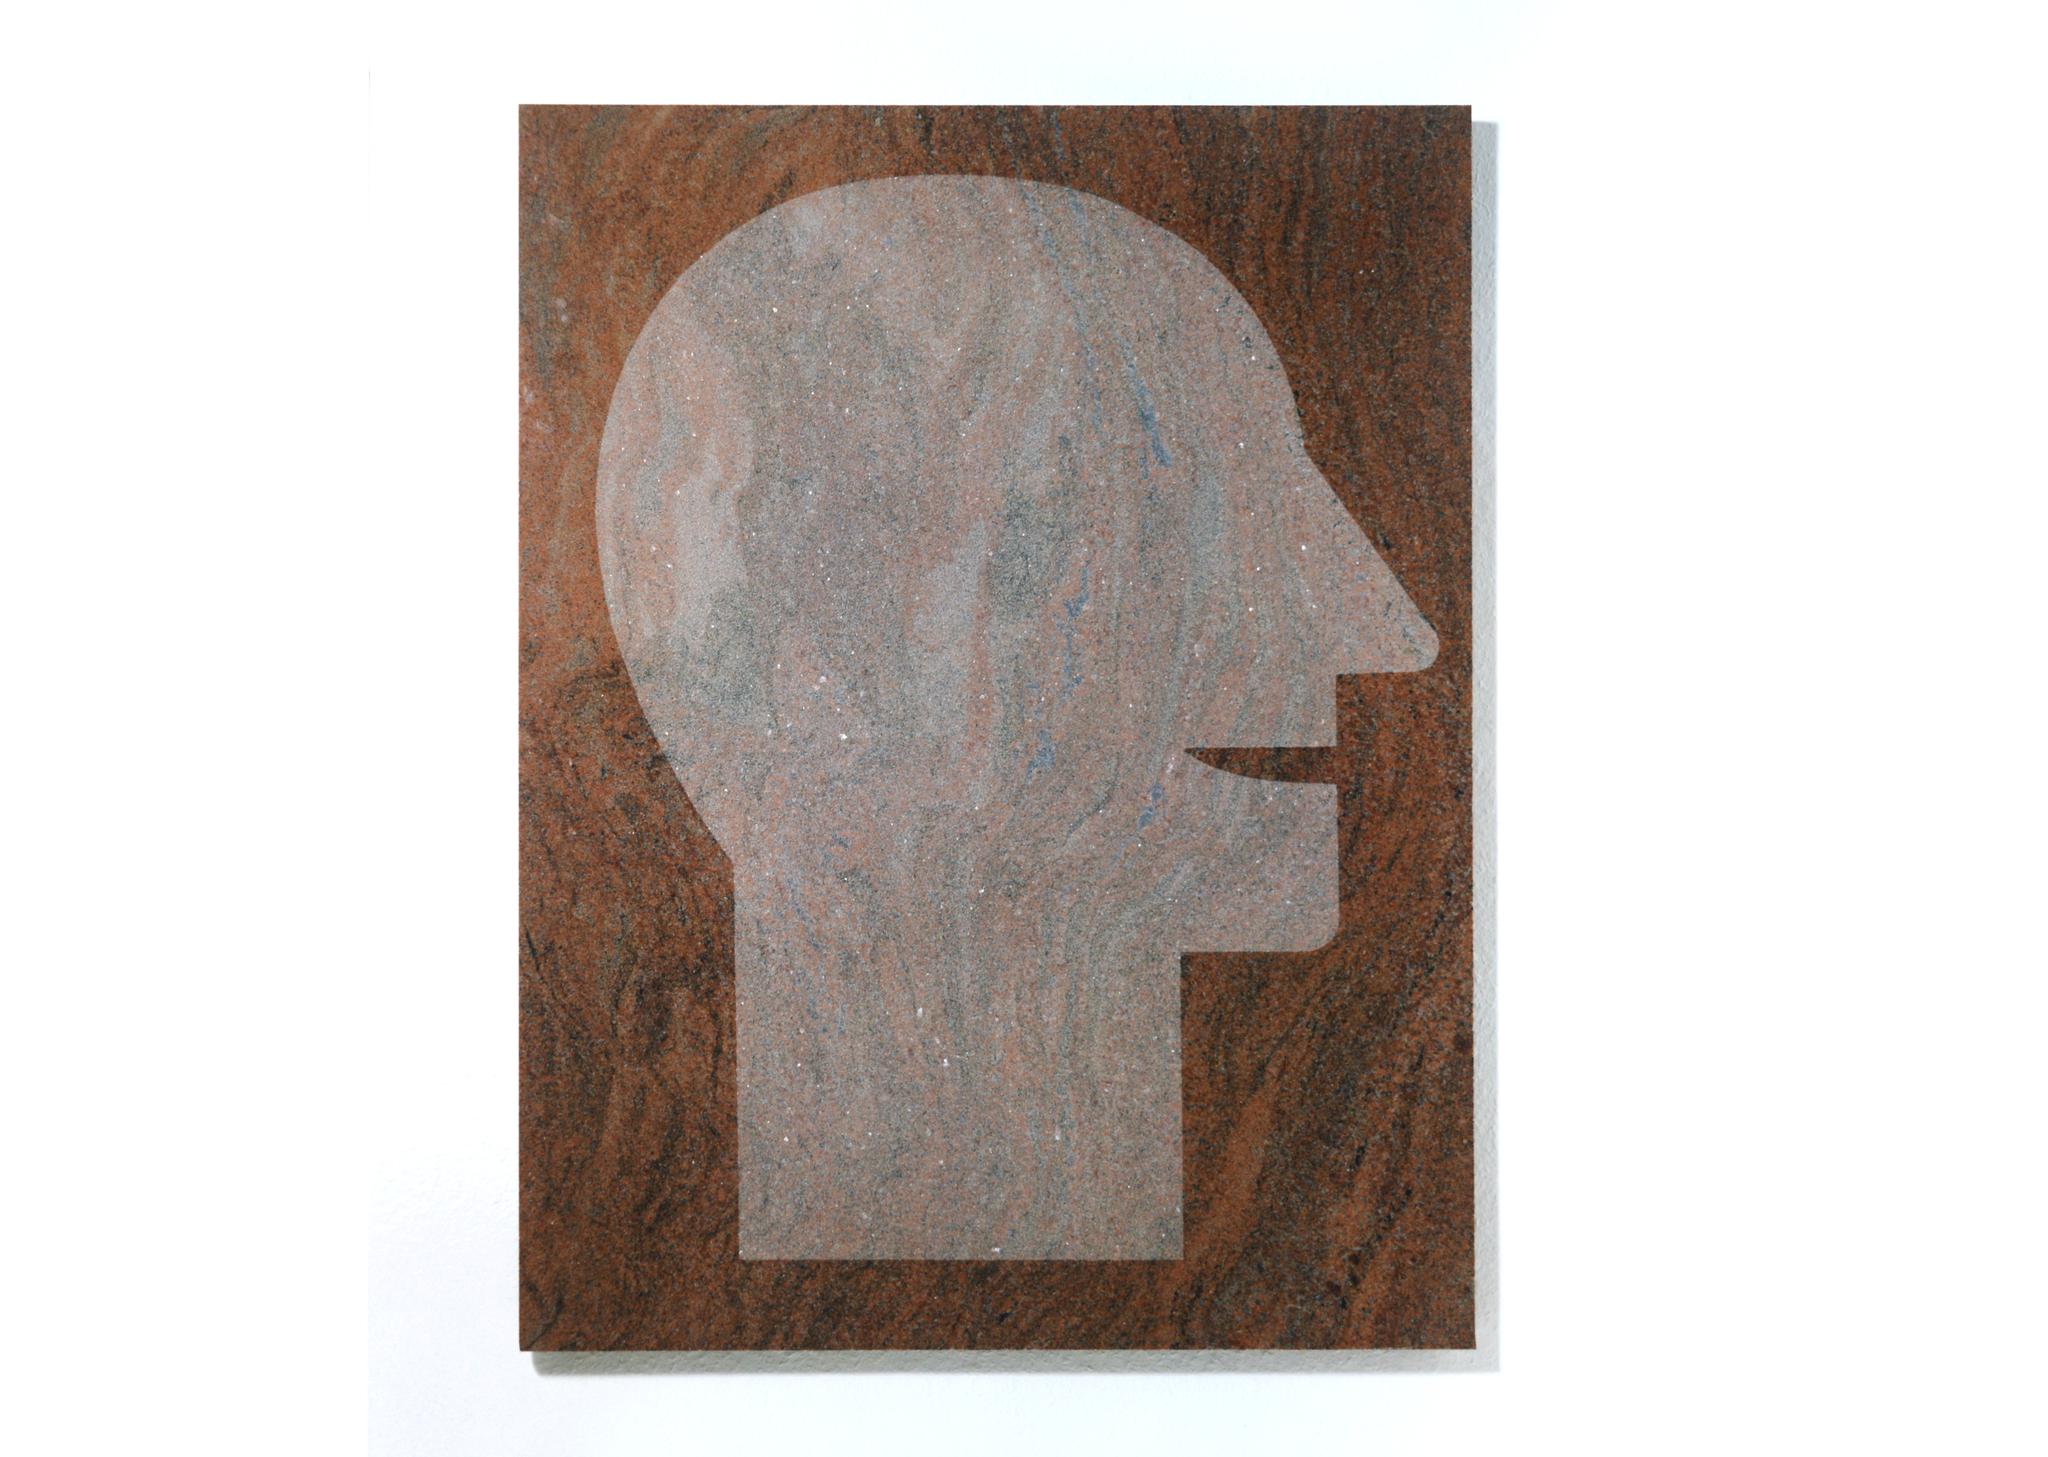 """Stehender Kopf"" 1986, sandgestrahlter Stein (roter Granit) 114 x 88 x 2 cm - Foto Hadler/Stuhr"